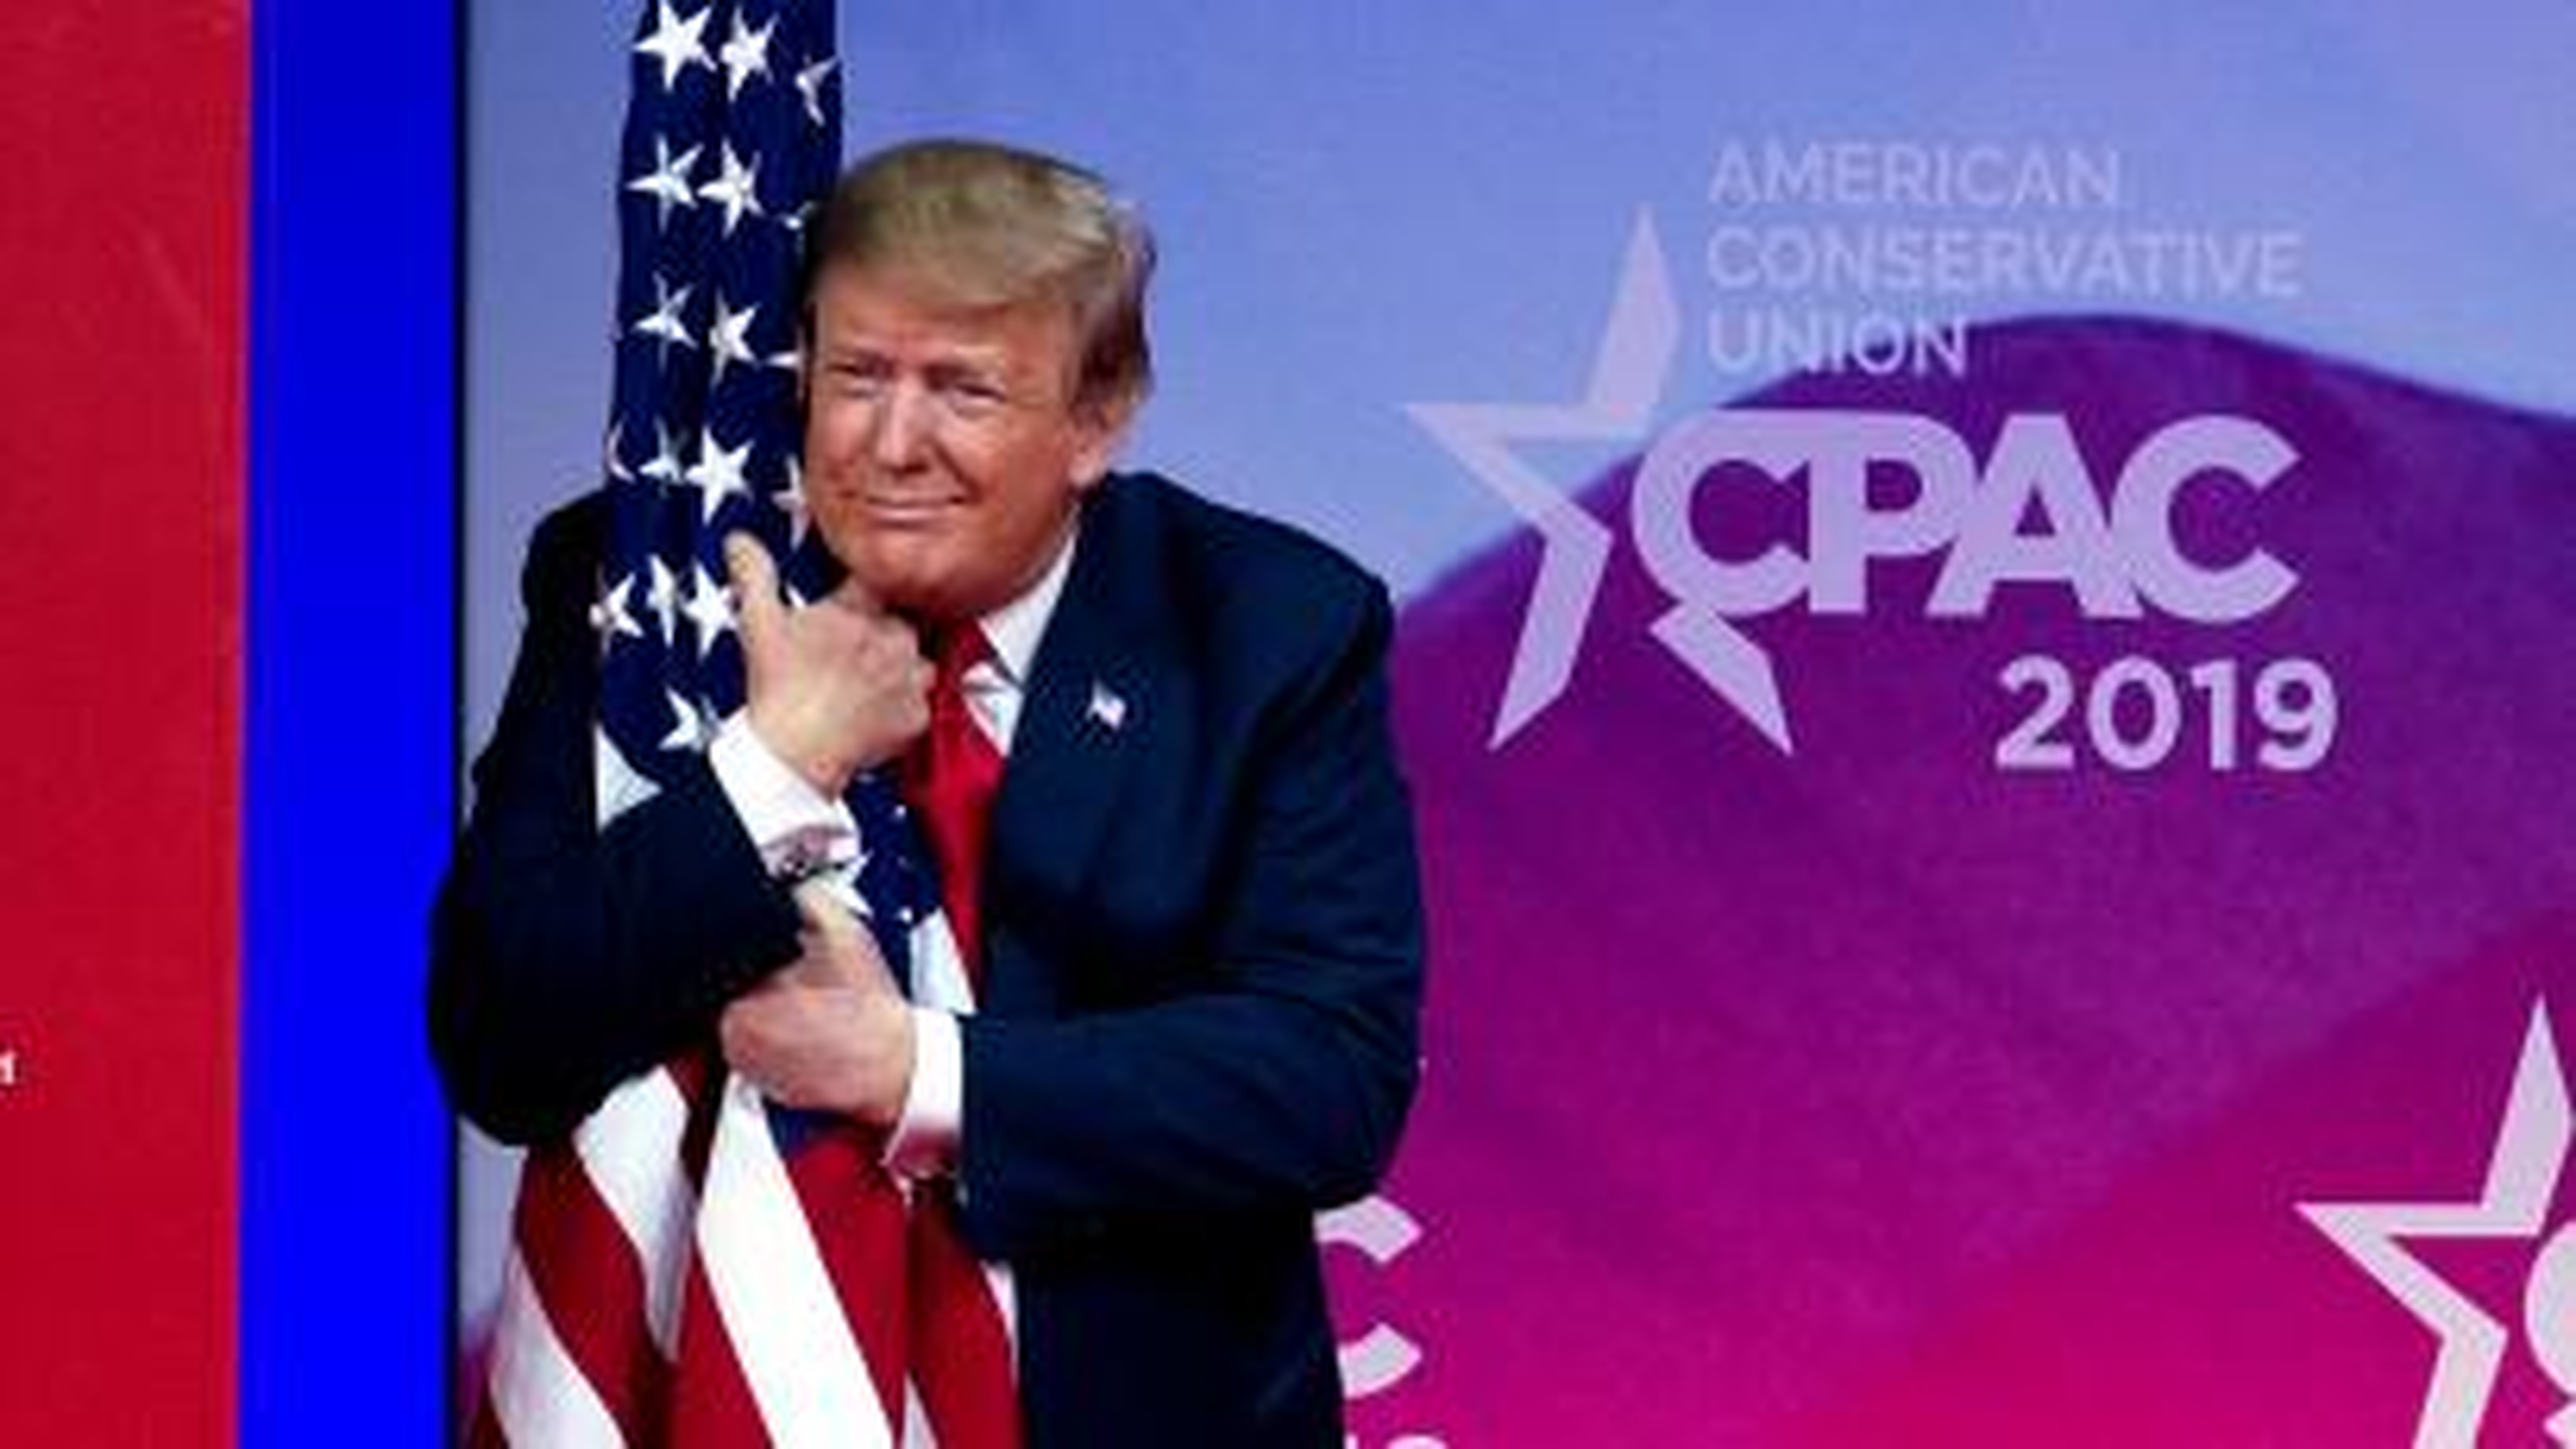 President Donald Trump hugs the American flag